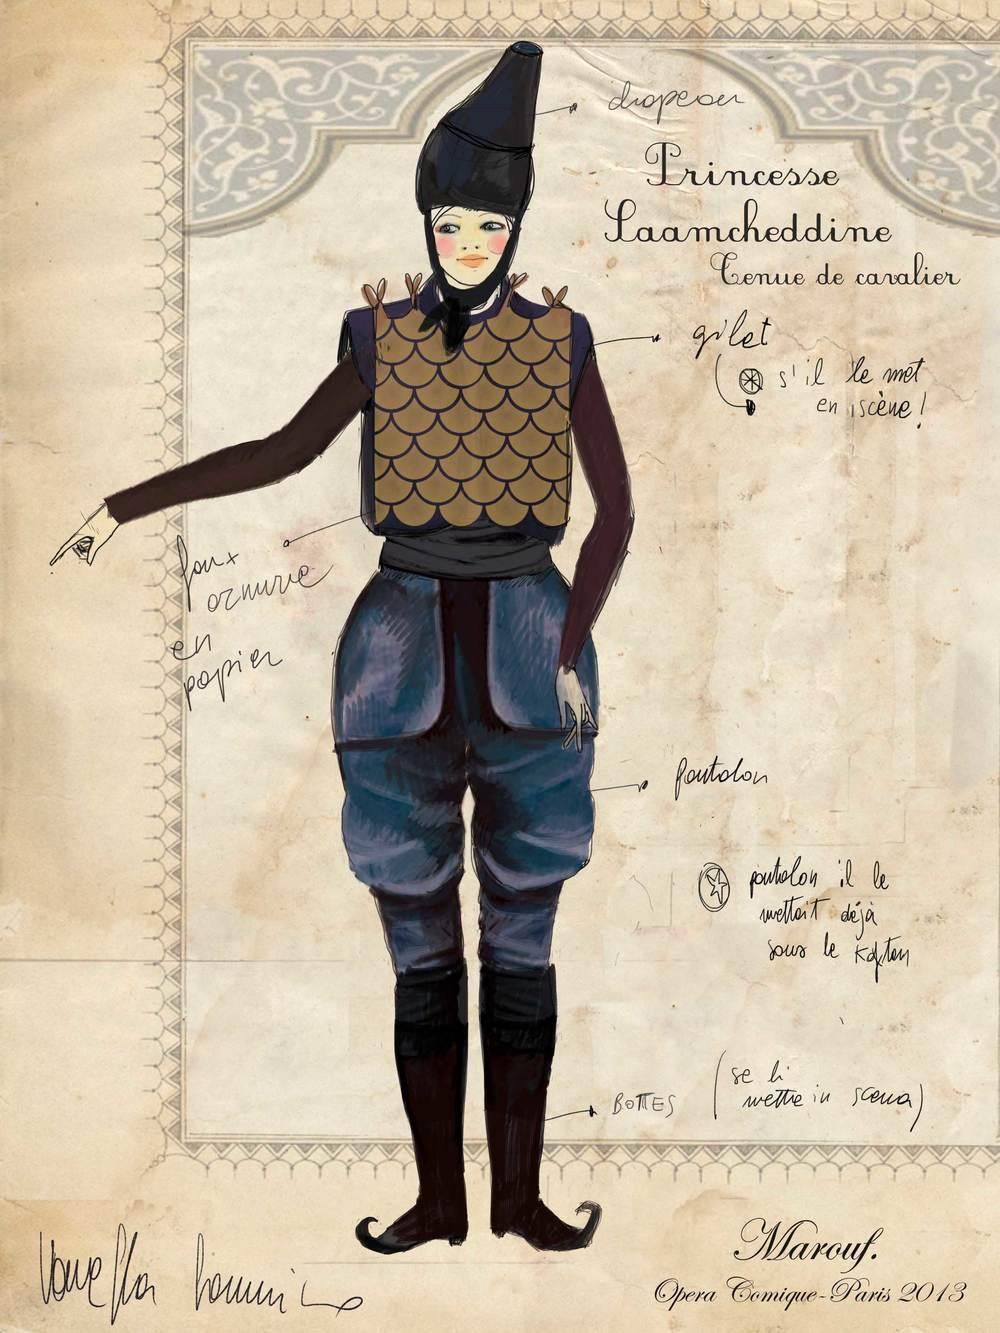 saamcheddine-cavaliere-nouveau.jpg